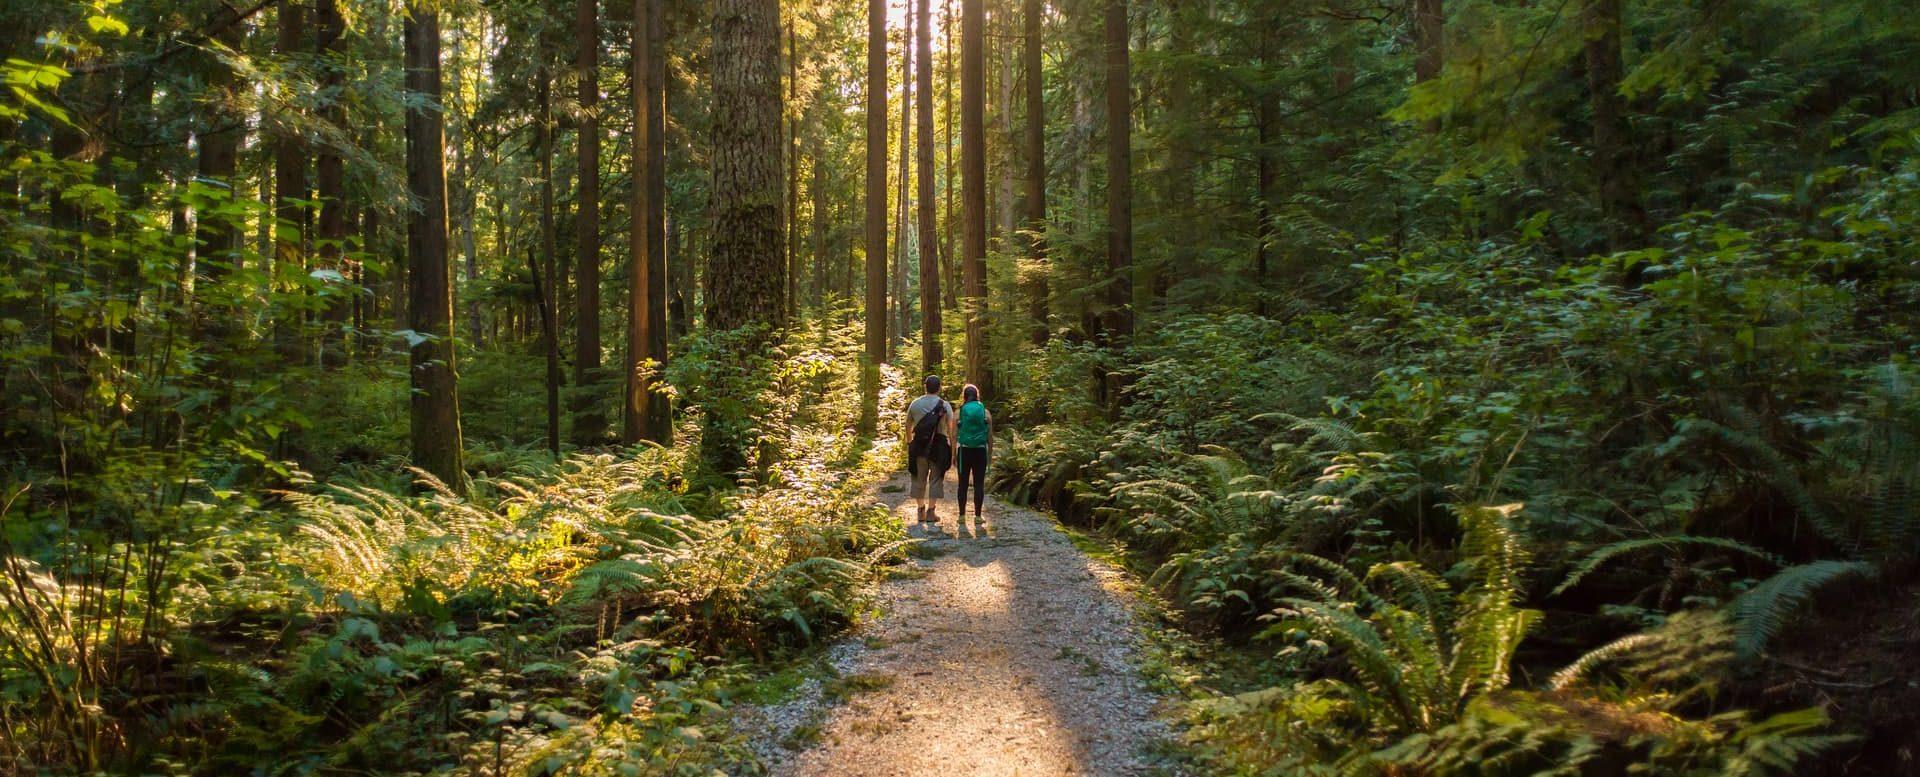 walks-forest-cedar-lodge-hotel.min_-e1548427508621.jpg